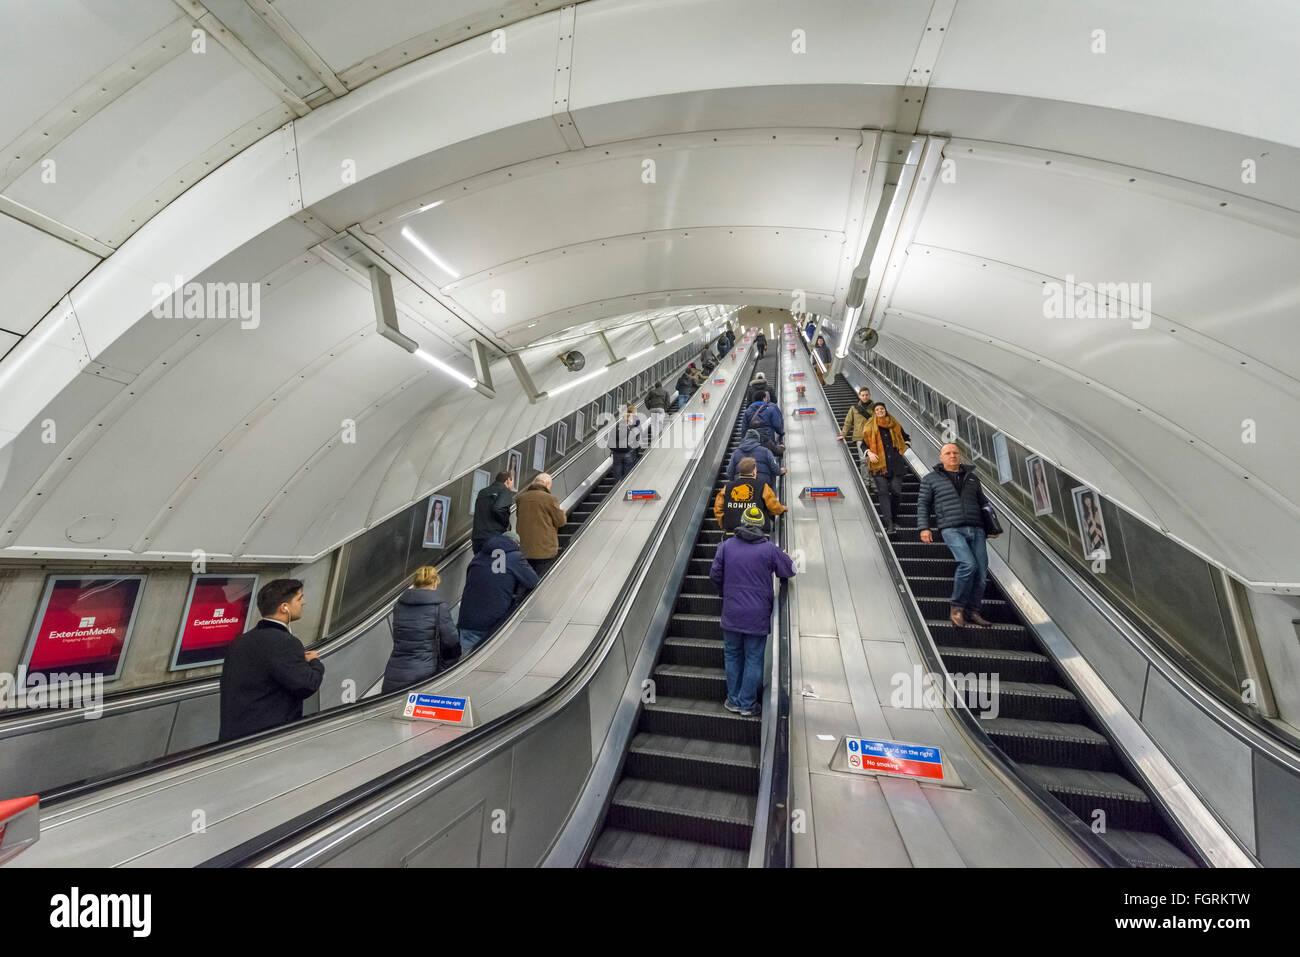 Escalator at Leicester Square underground station, London, England, UK - Stock Image